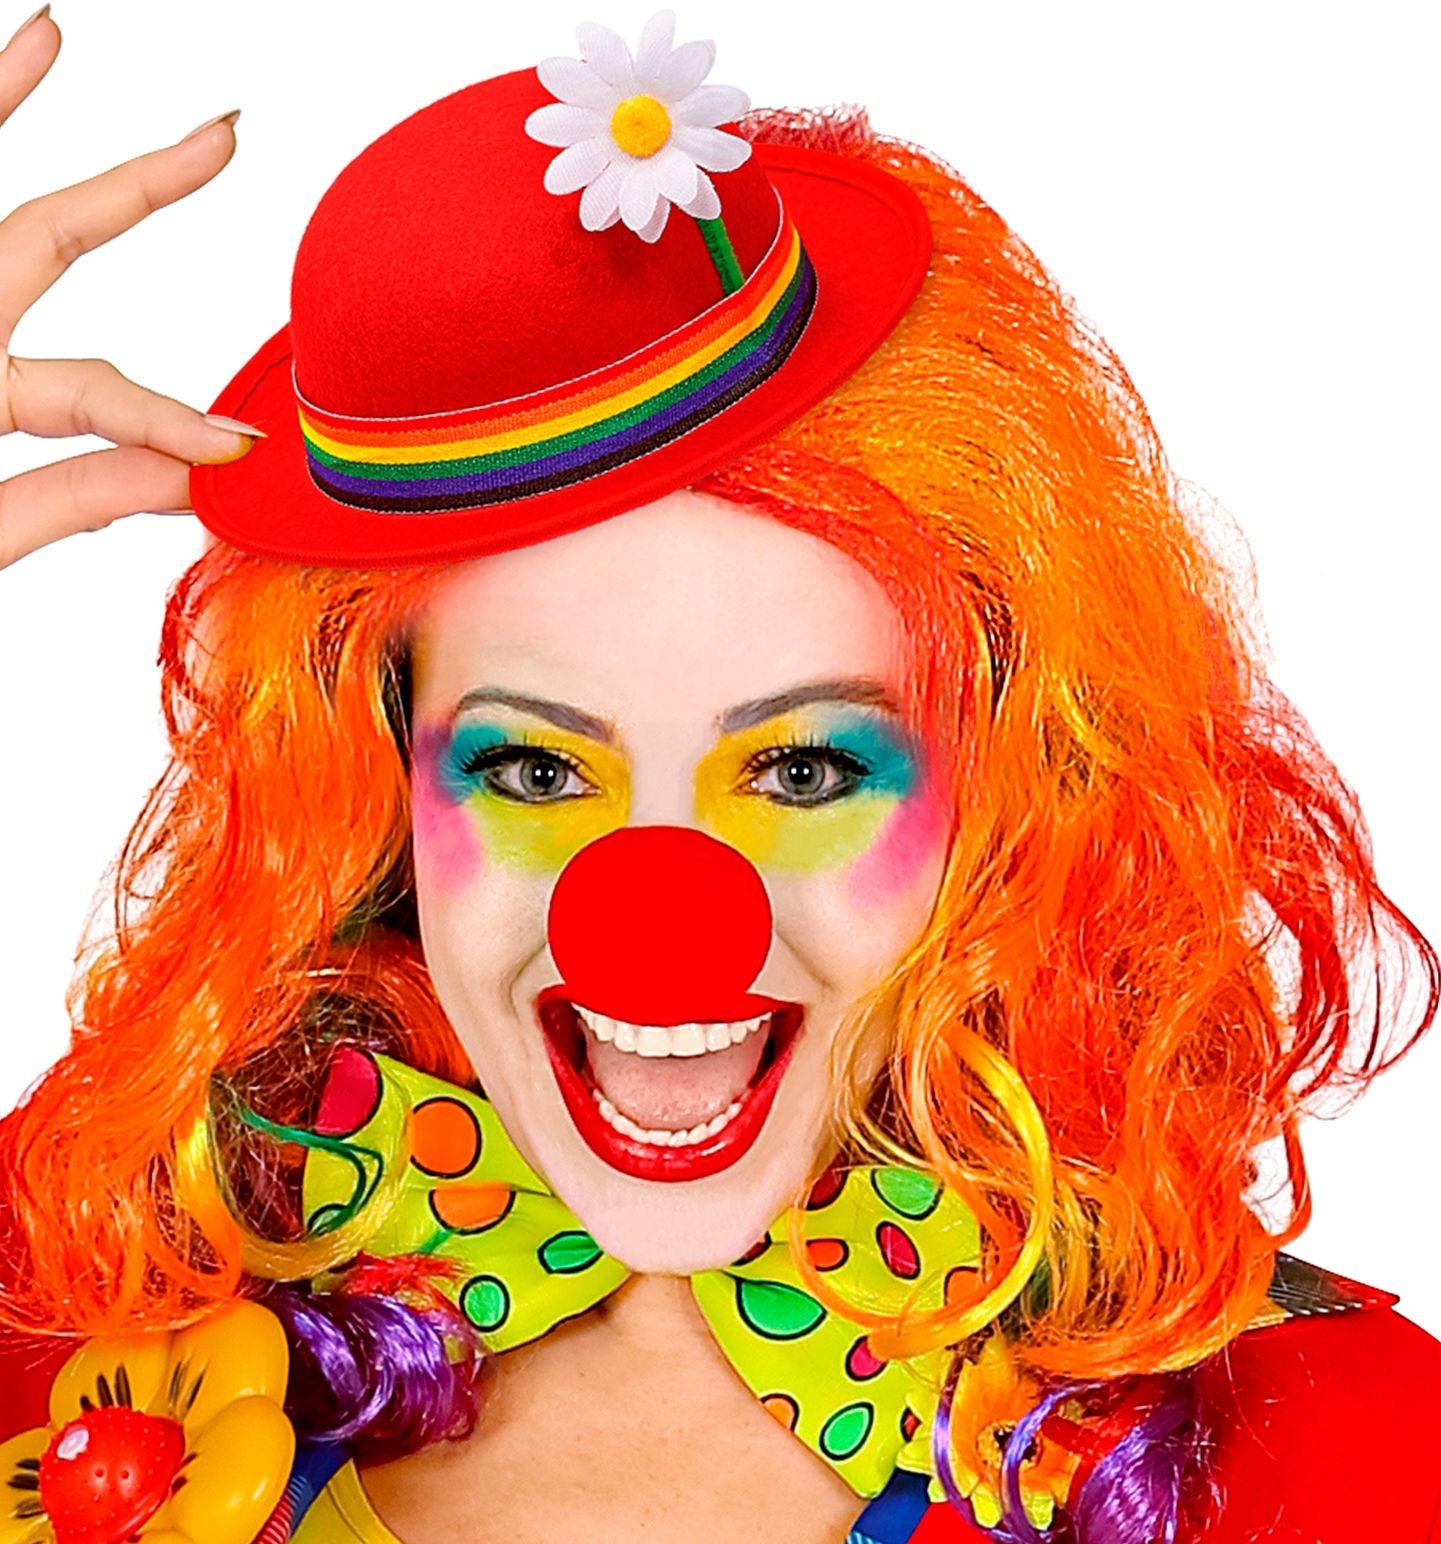 Rode hoed met regenboog band clowns